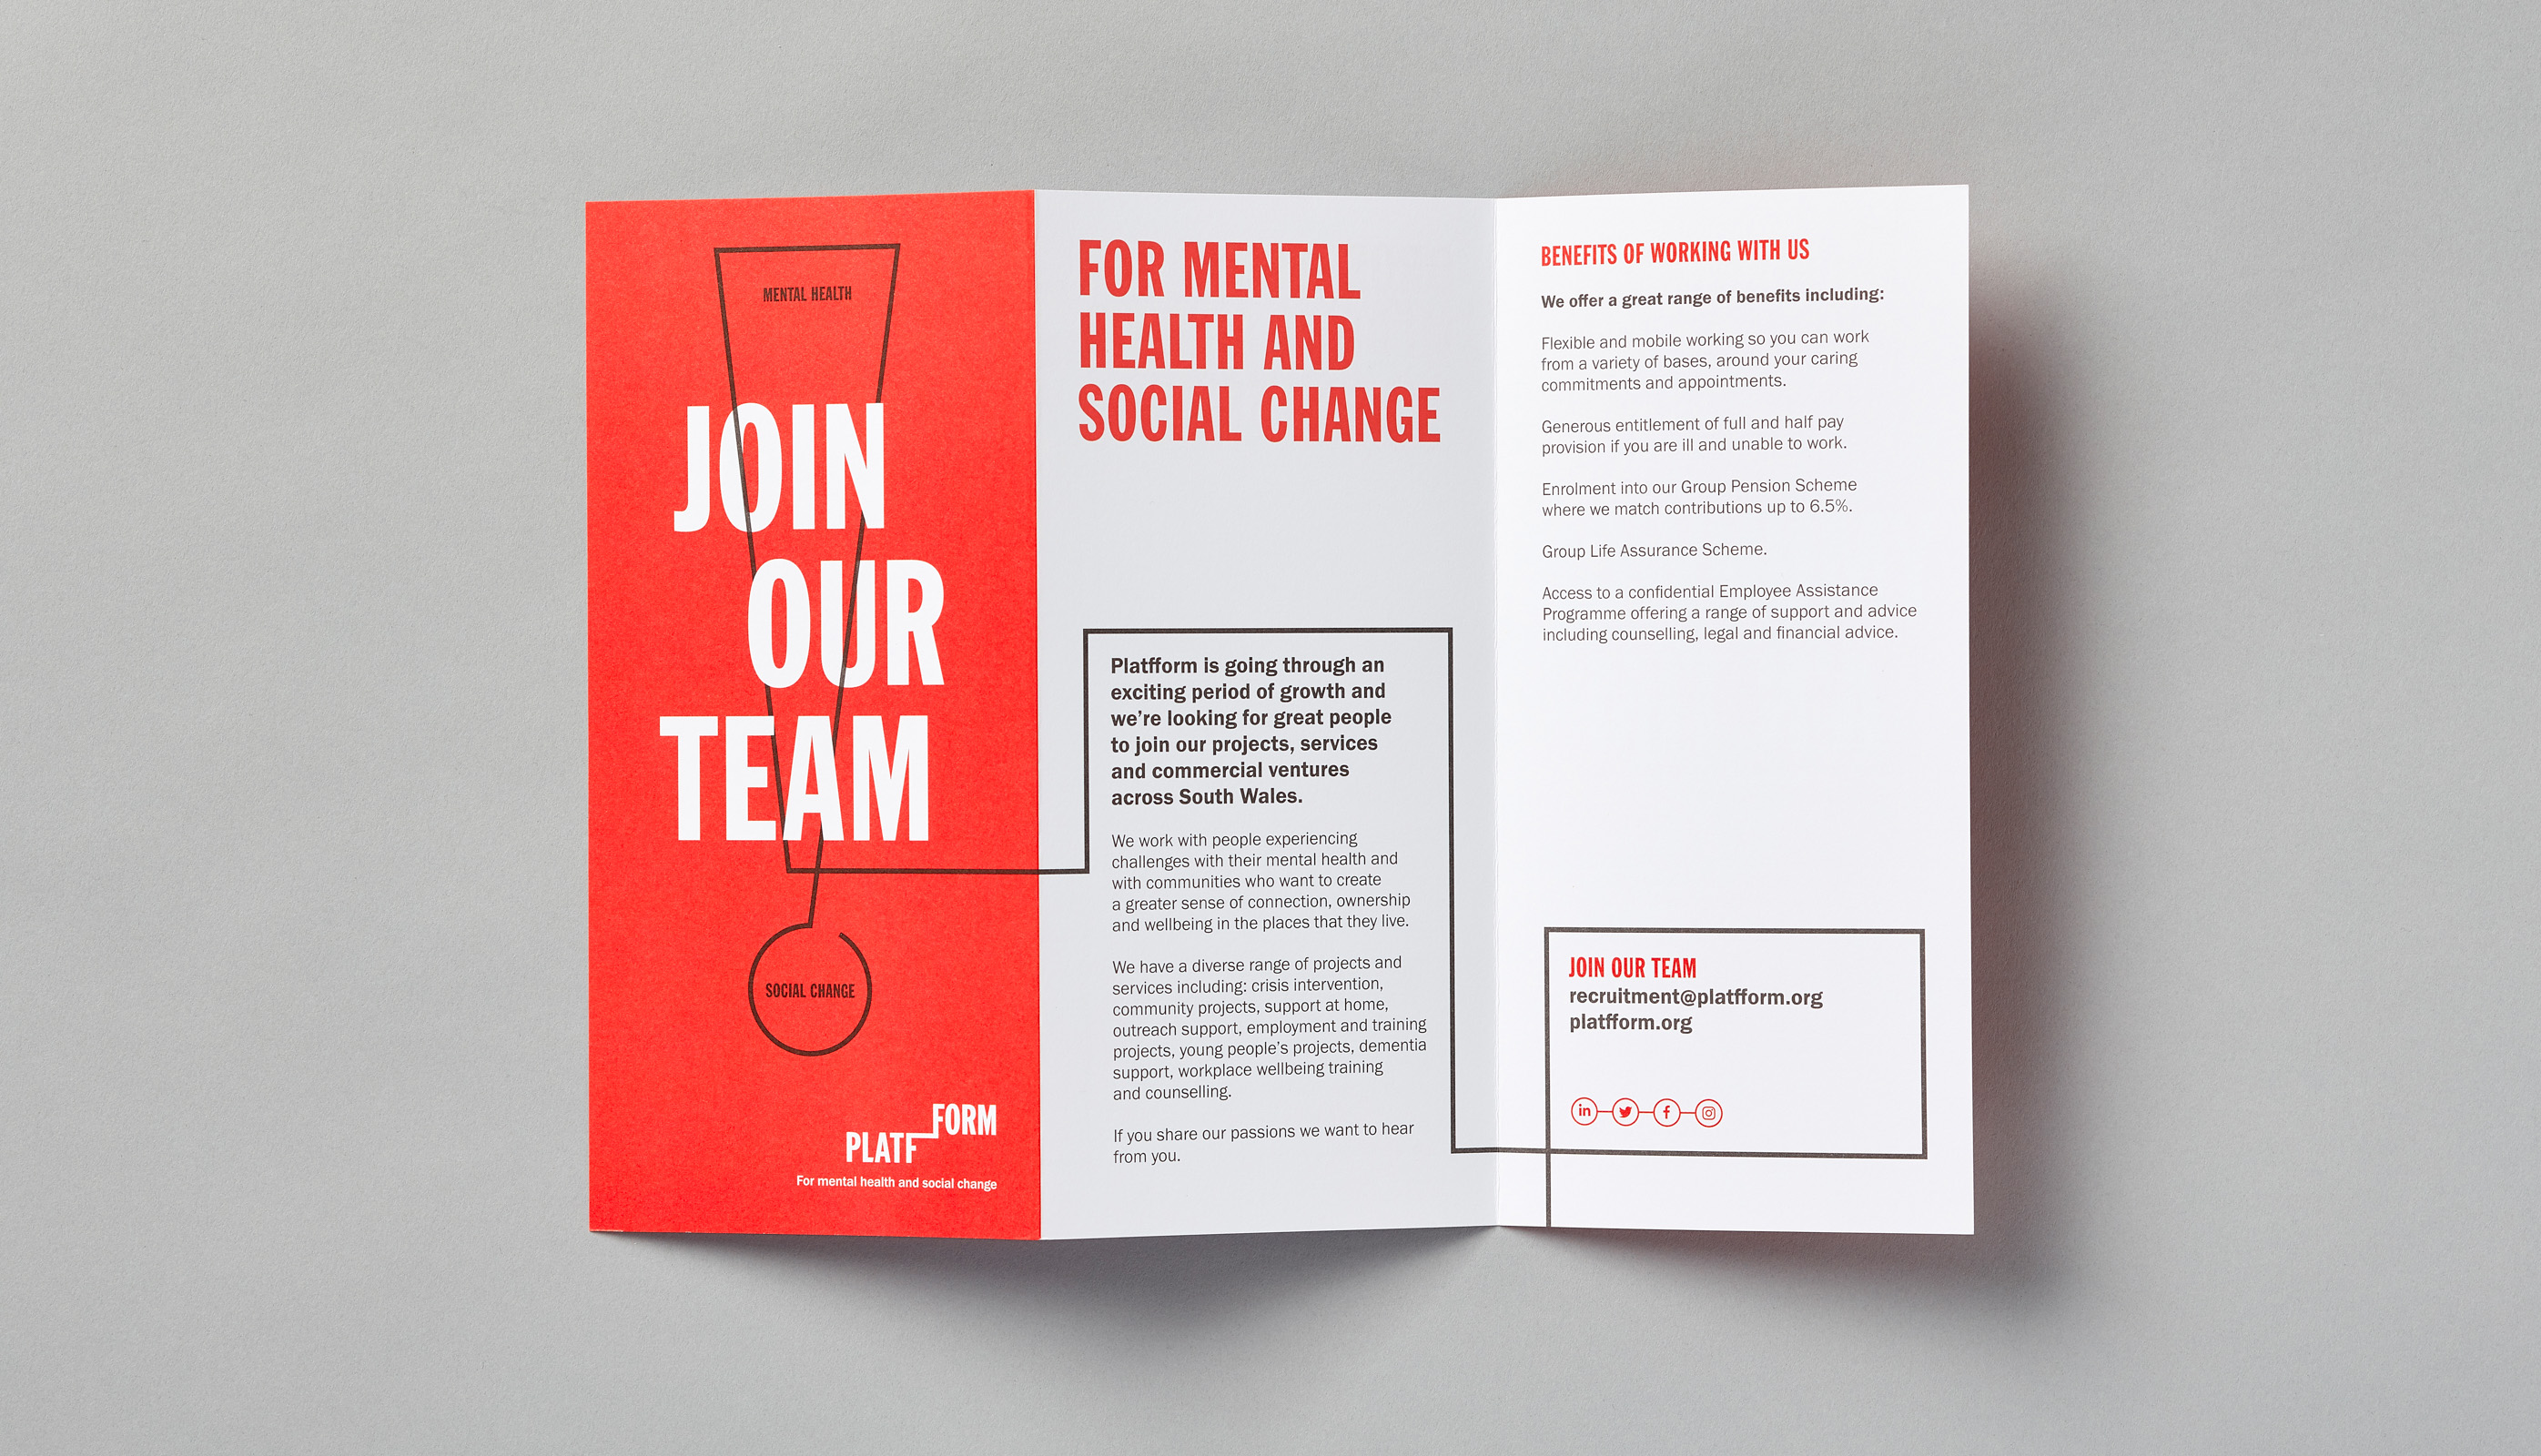 Platfform recruitment leaflet